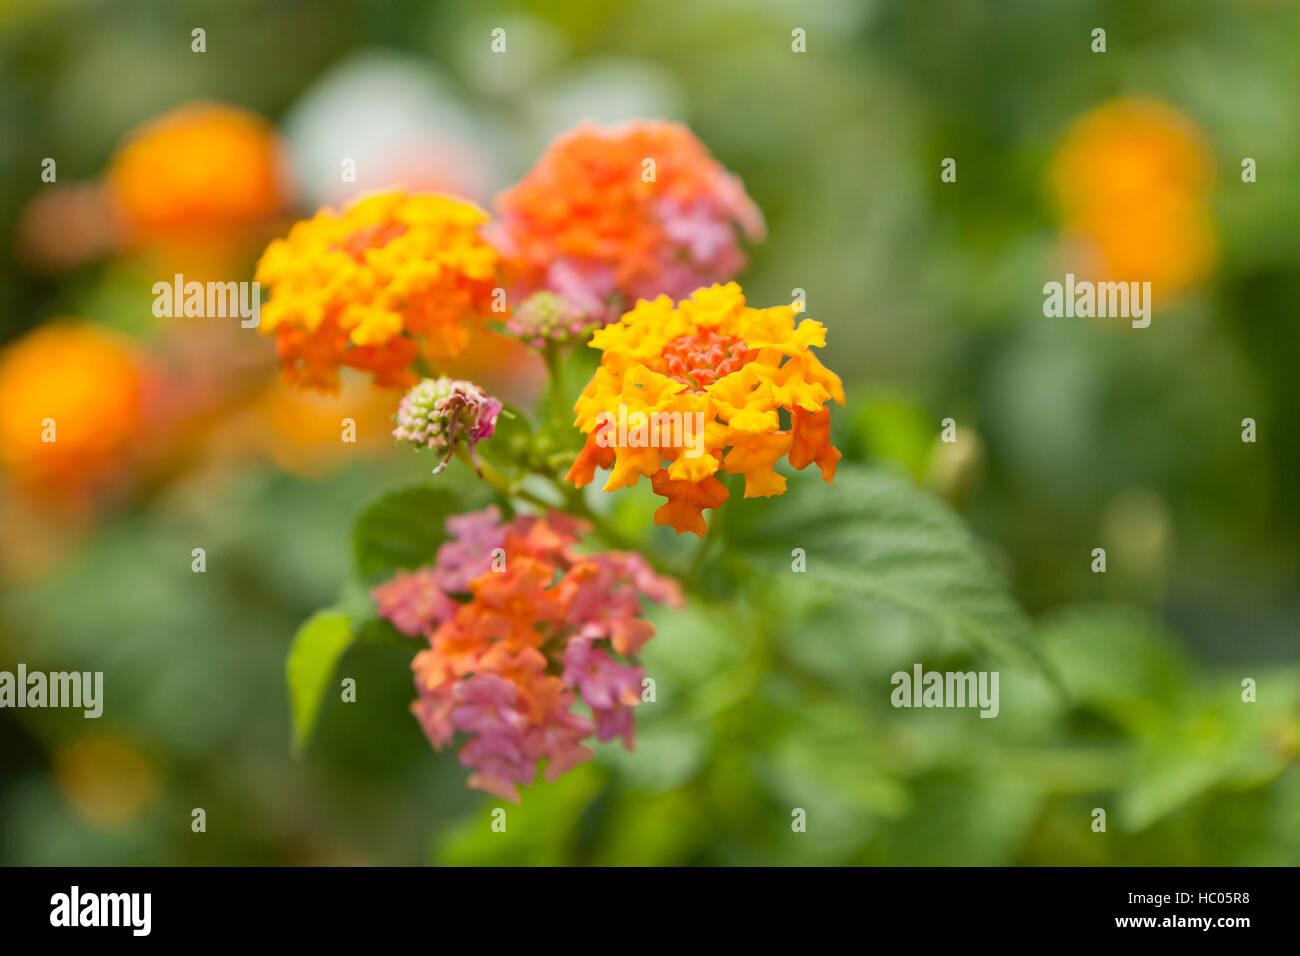 Lantana flowers (Lantana camara) - USA - Stock Image